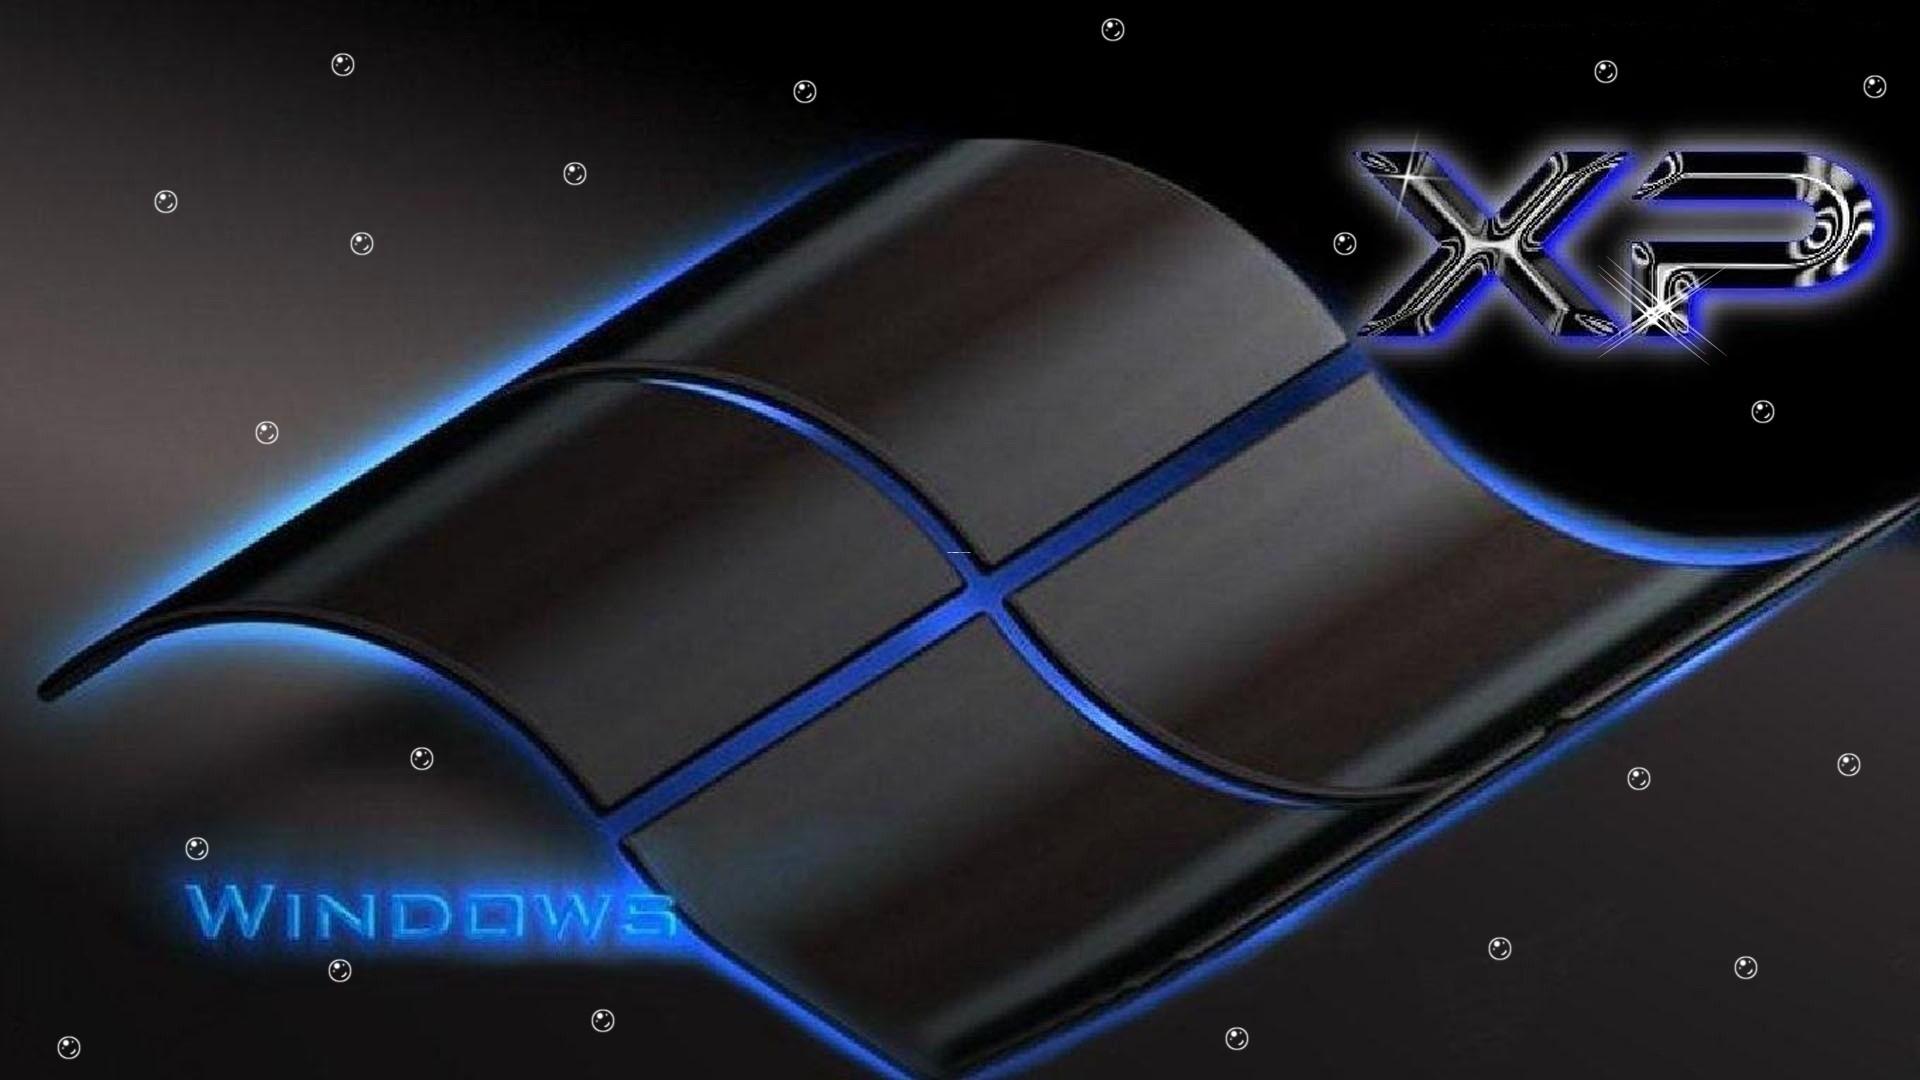 Windows xp wallpaper hd wallpapertag - Car wallpaper for windows xp ...